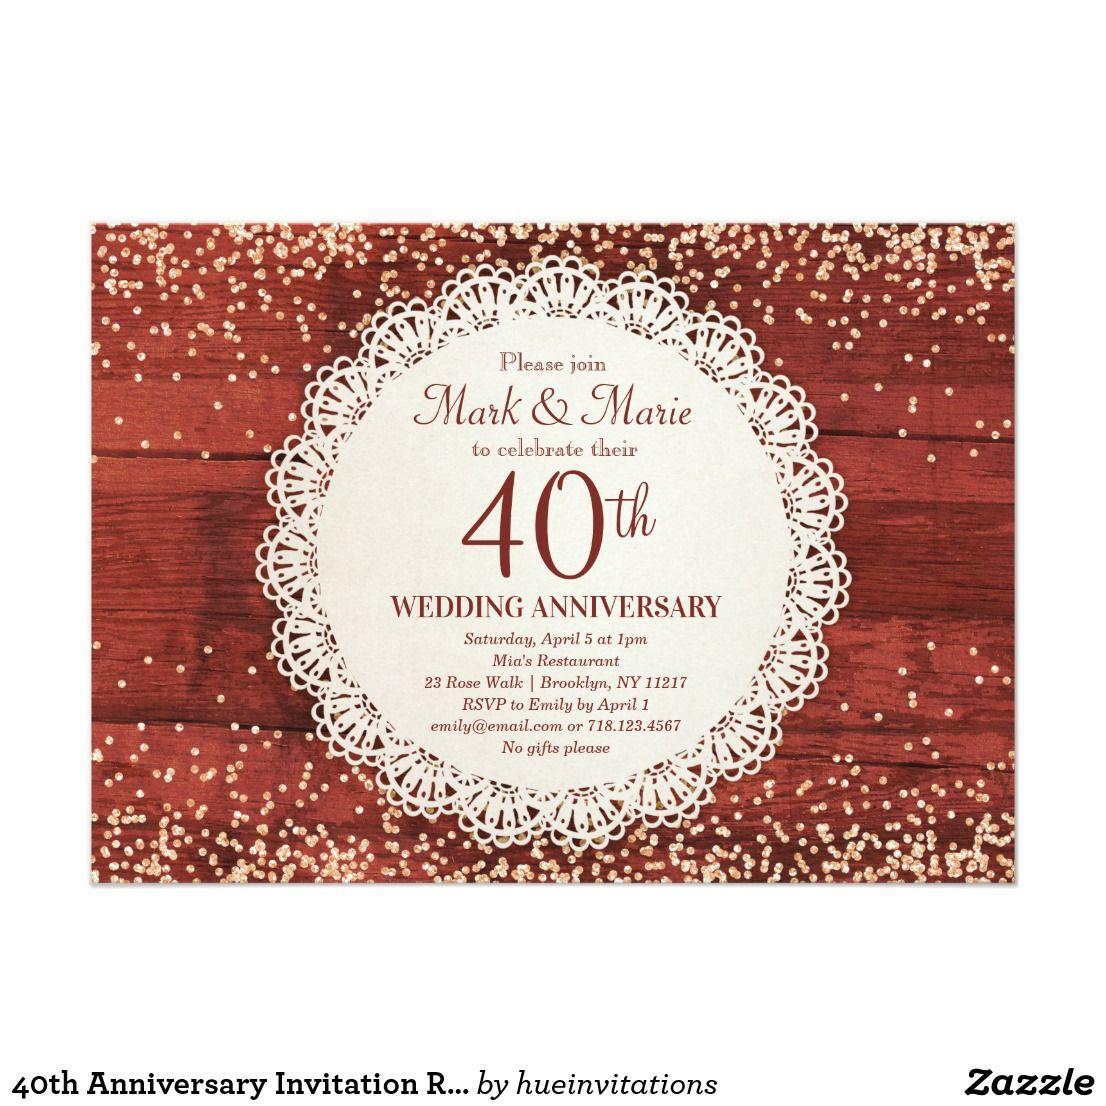 40th Anniversary Invitation Red Ruby Anniversary | Hue Invitations ...